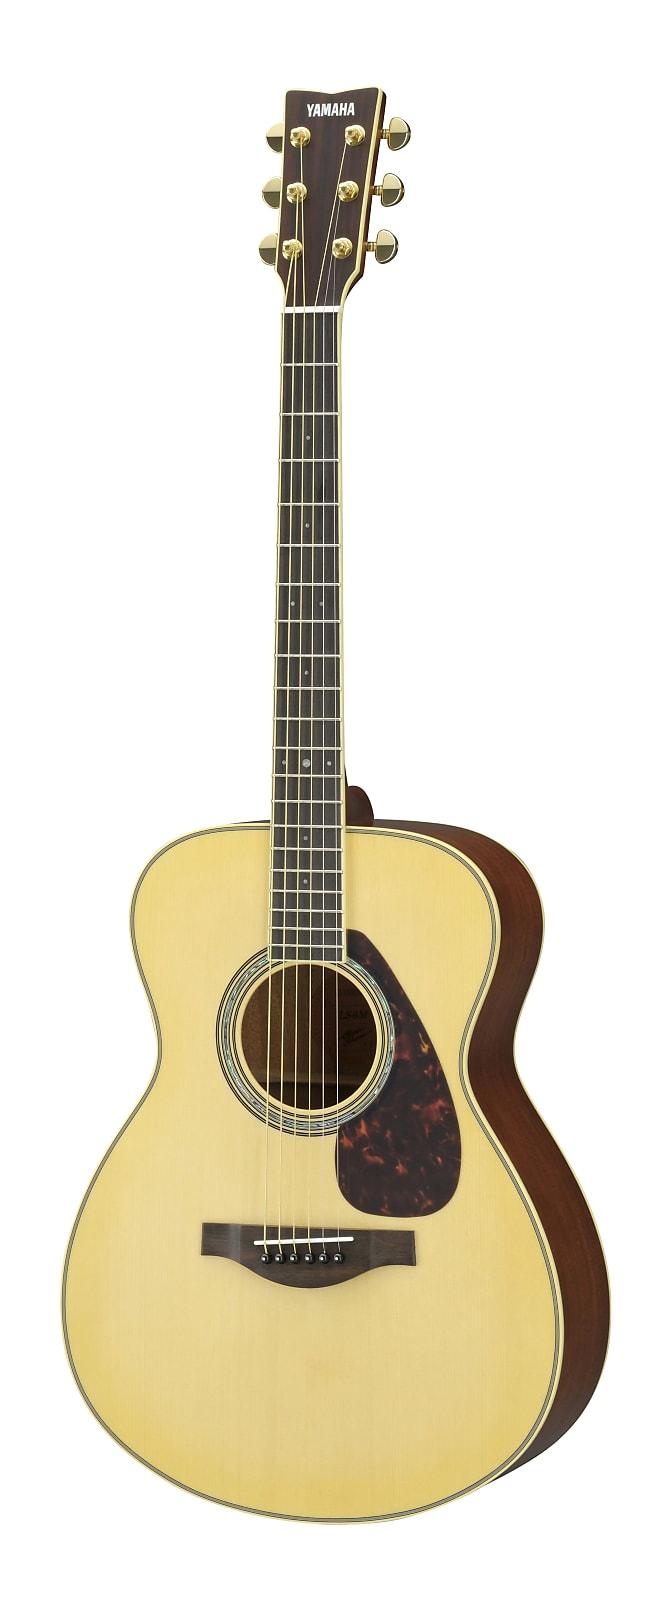 Yamaha LS6M Spruce/Mahogany Concert Acoustic/Electric Guitar Natural